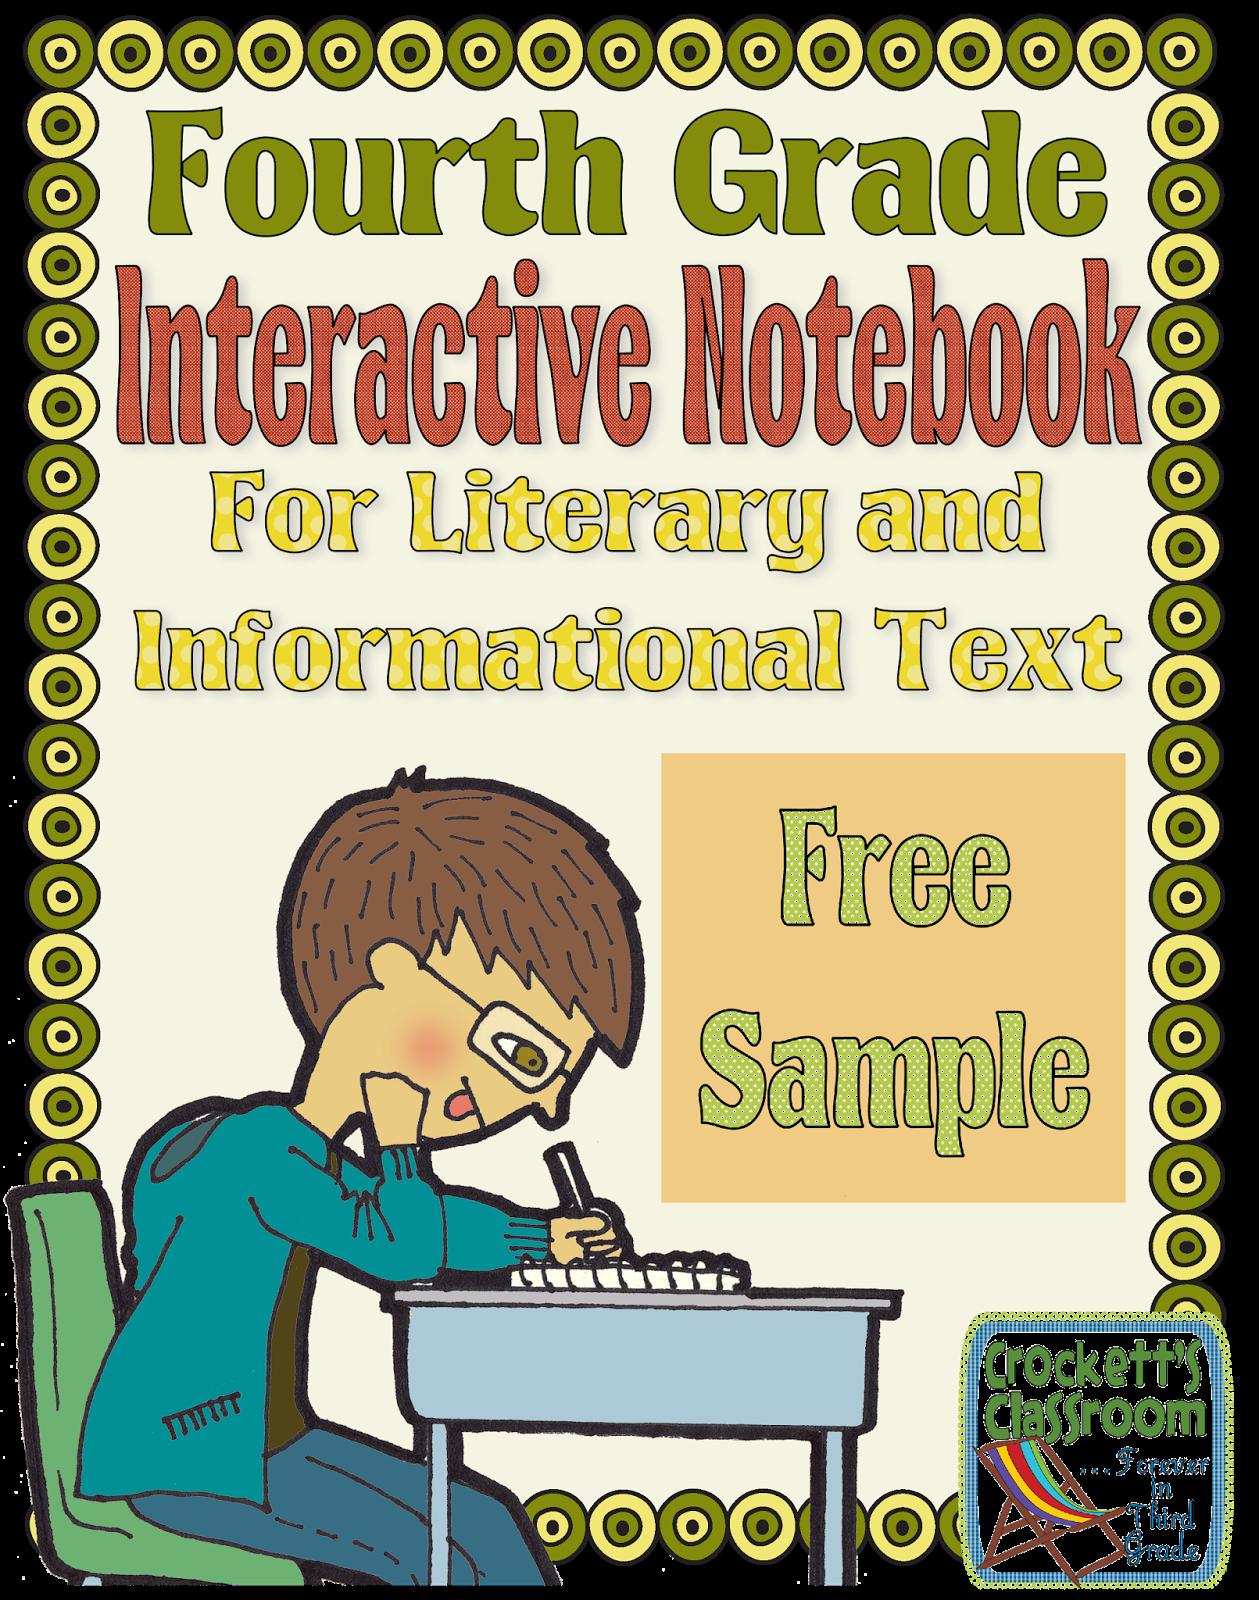 Fourth Grade Interactive Notebook Sample